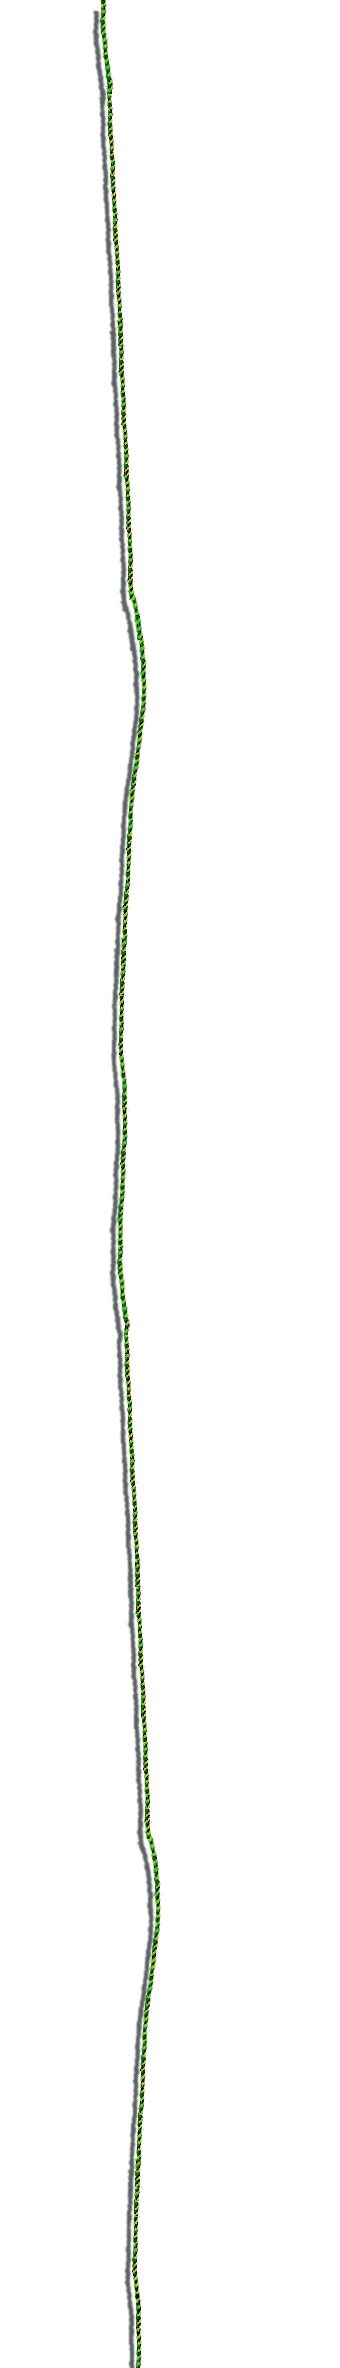 hilo verde.png